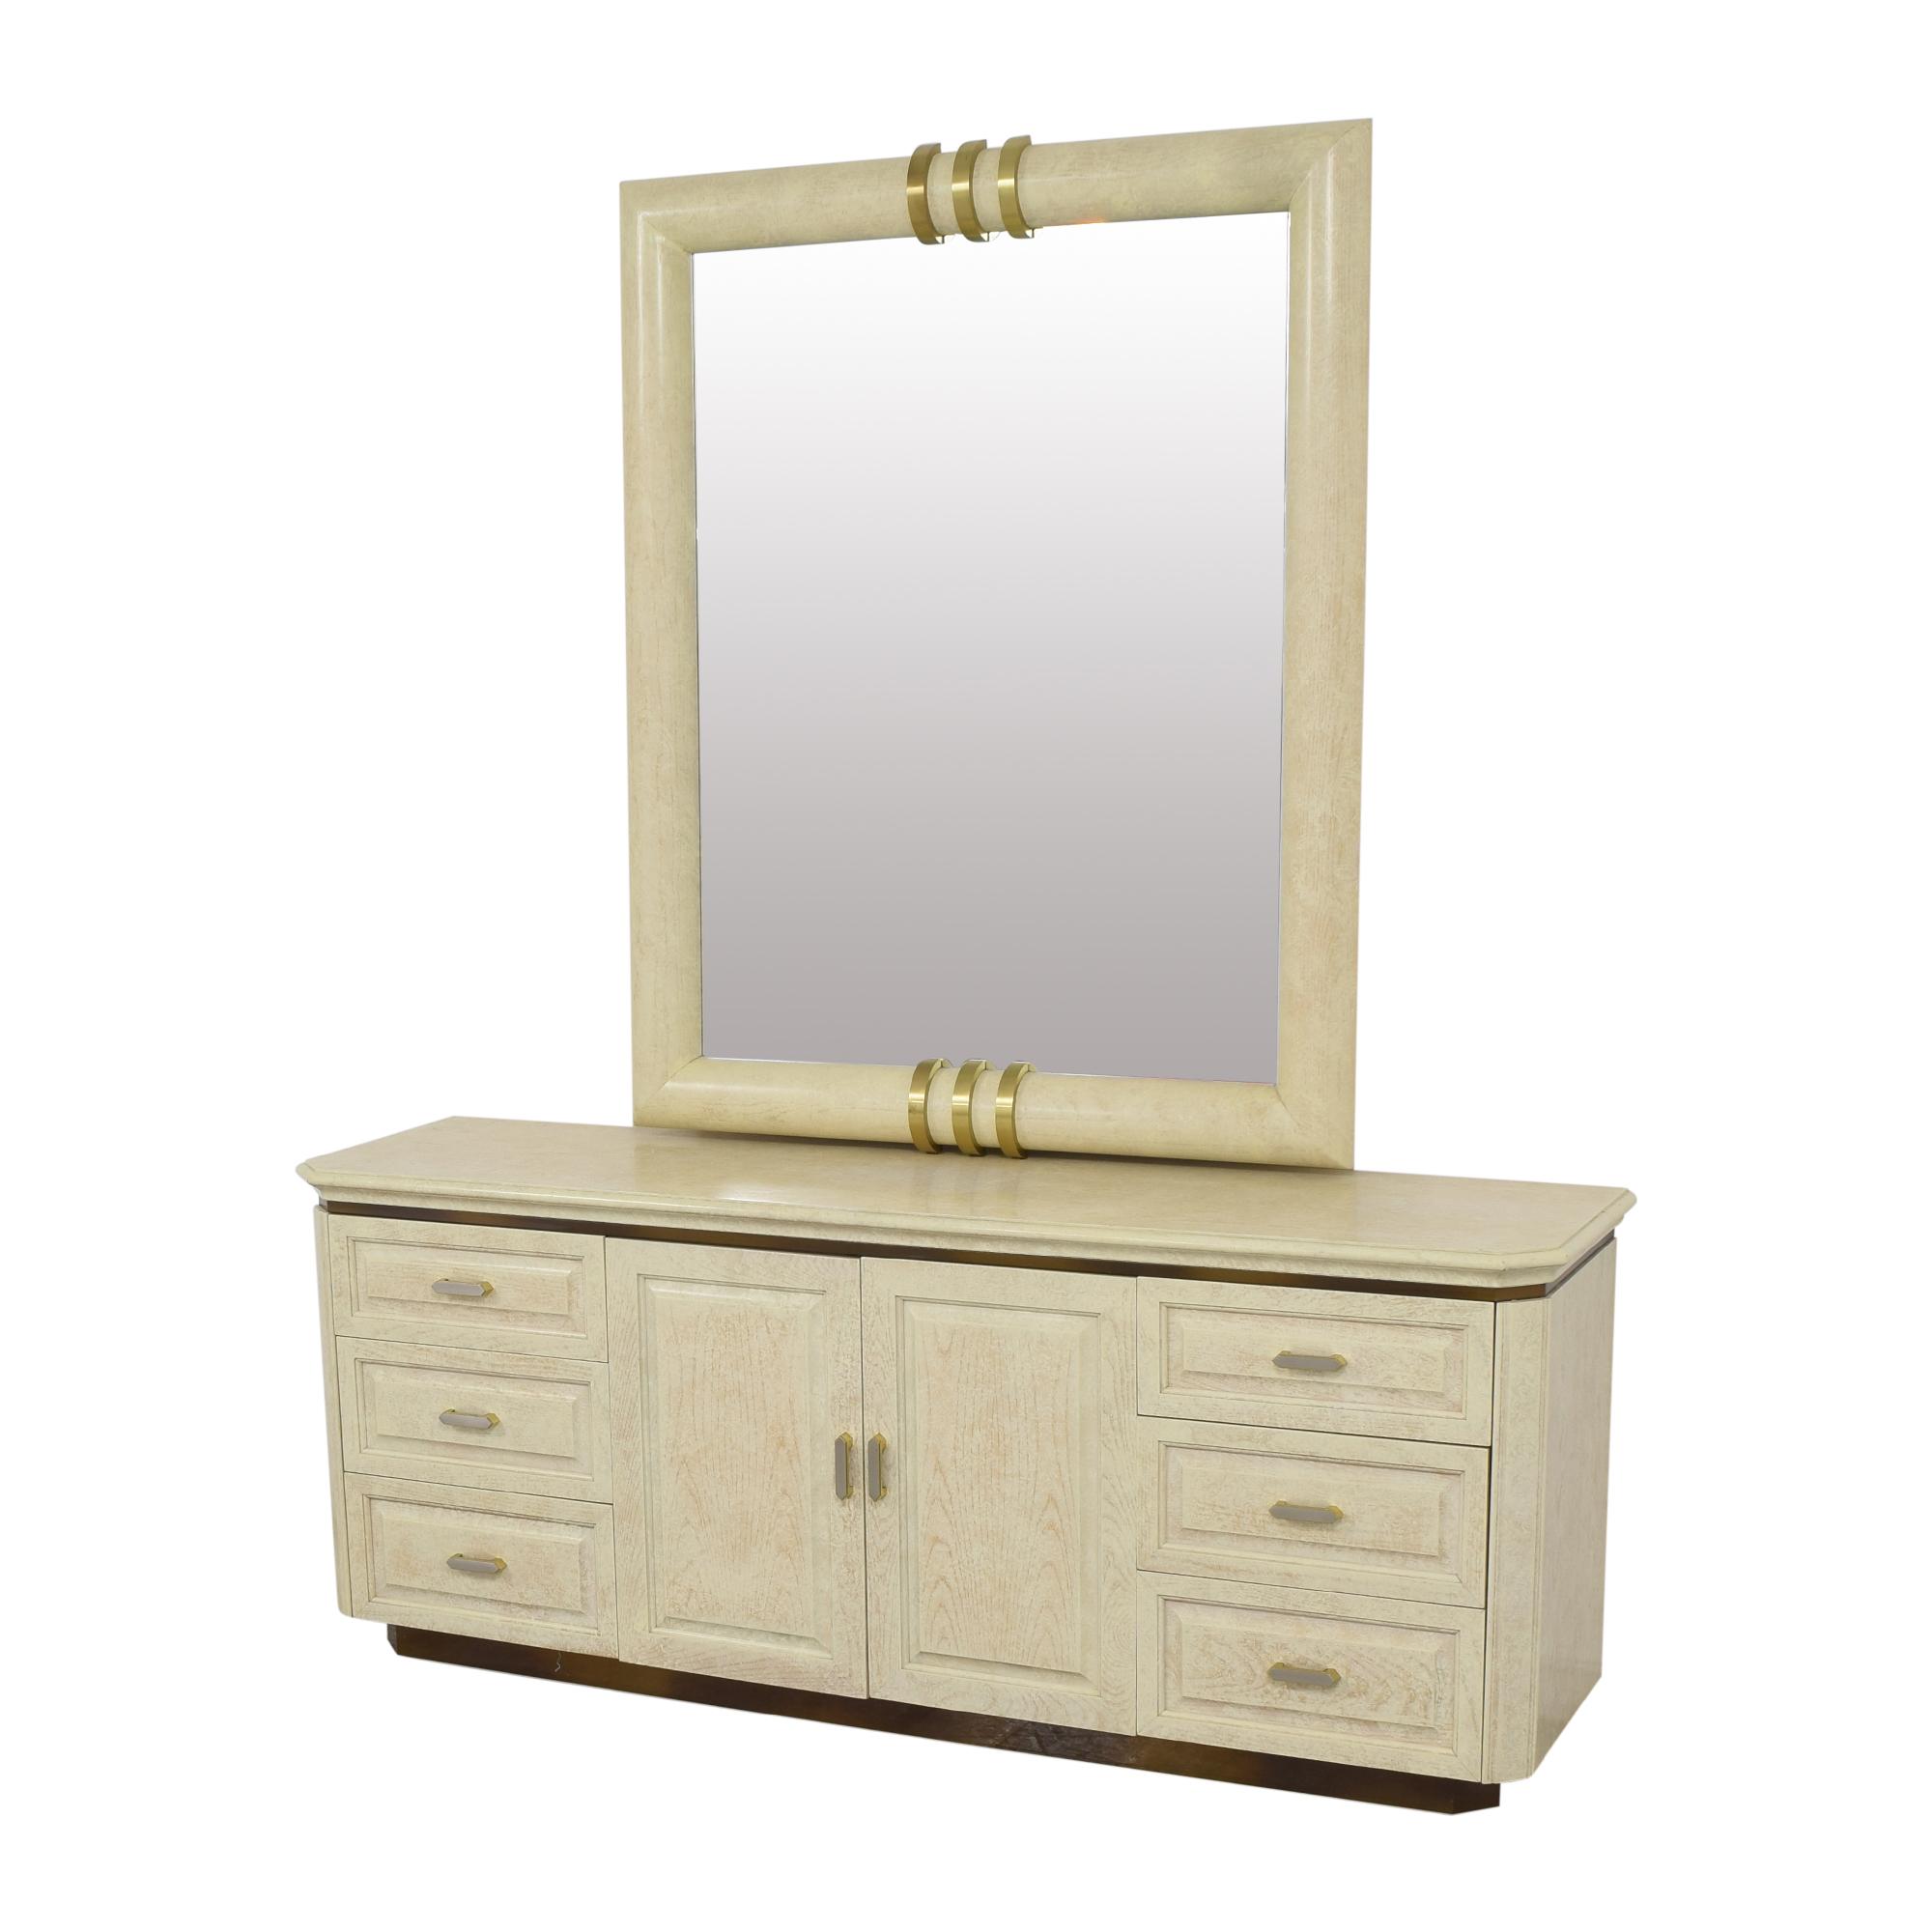 Henredon Furniture Henredon Art Deco Style Dresser and Mirror nyc